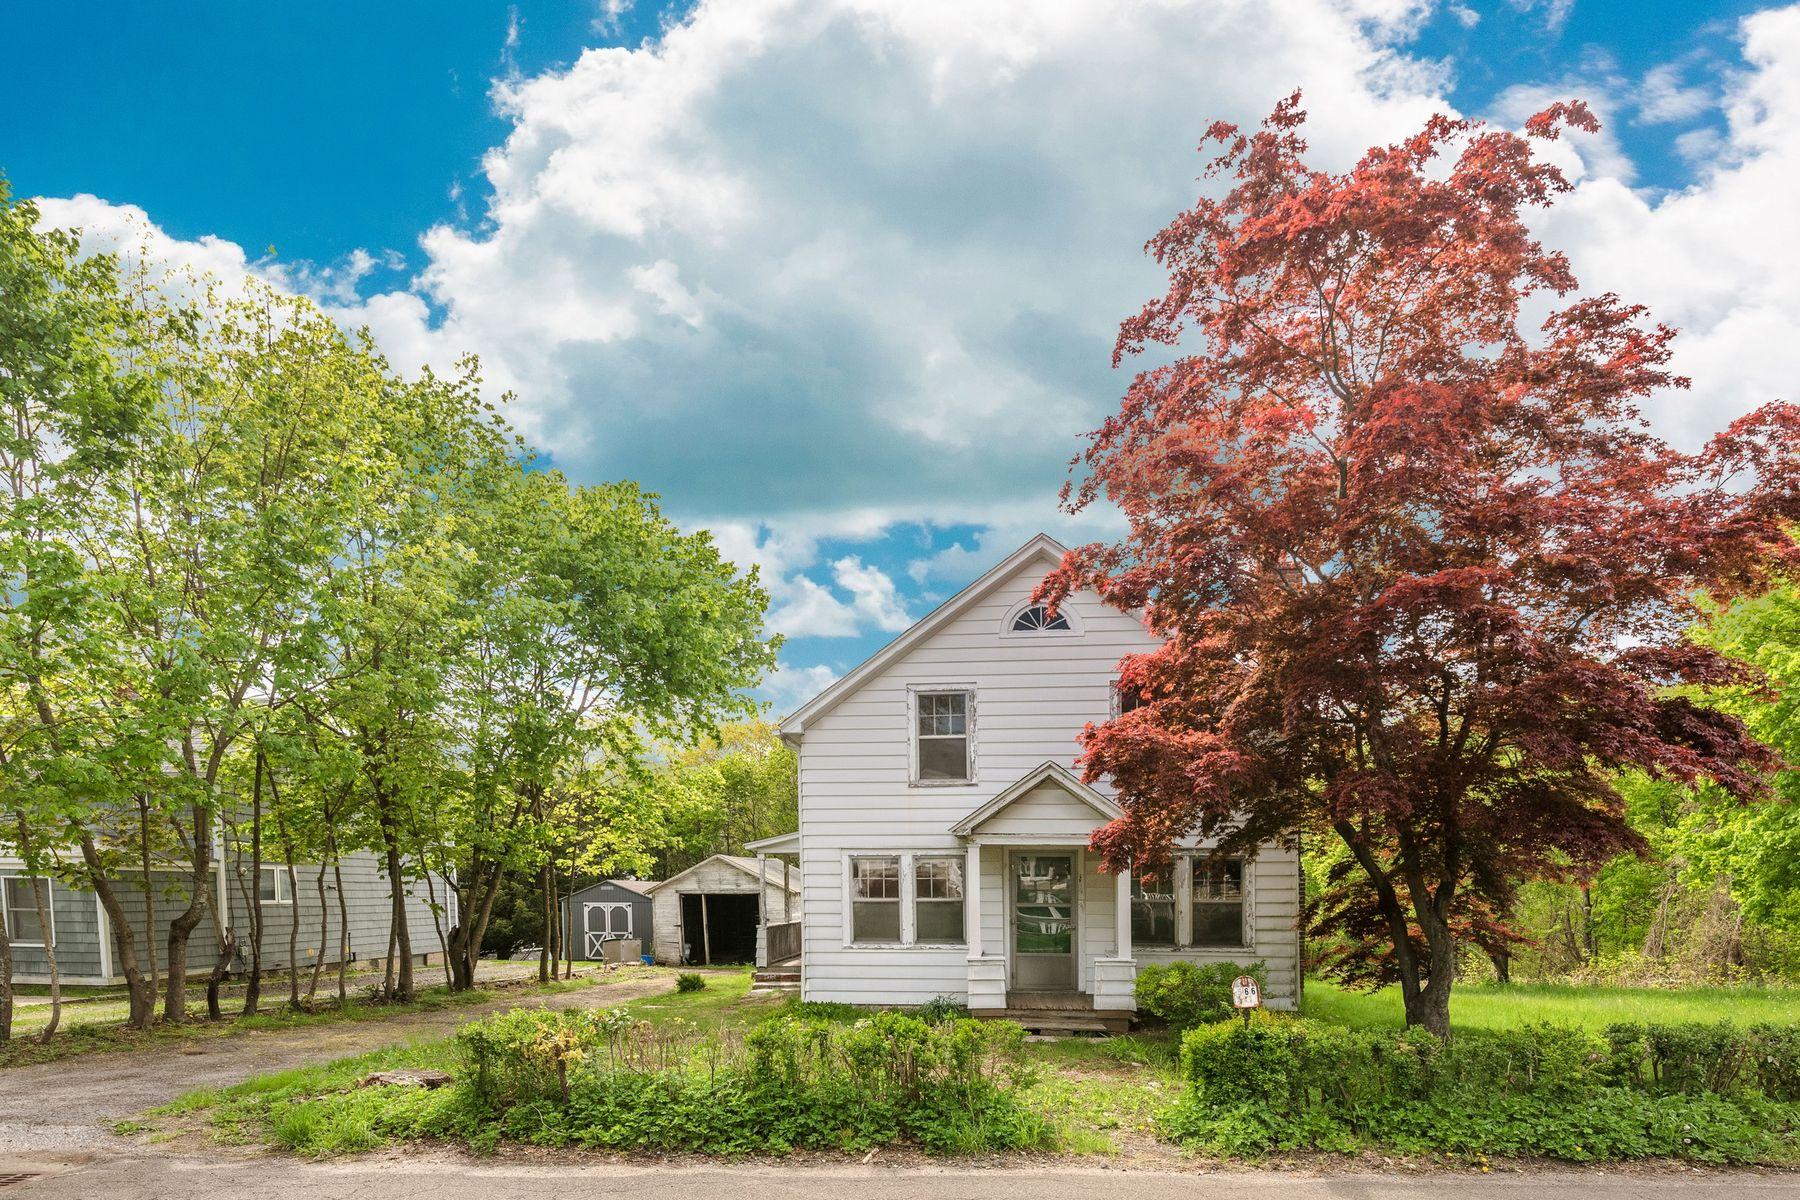 土地,用地 为 销售 在 Land Opportunity 566-L River Road, 科镇, 康涅狄格州 06807 美国